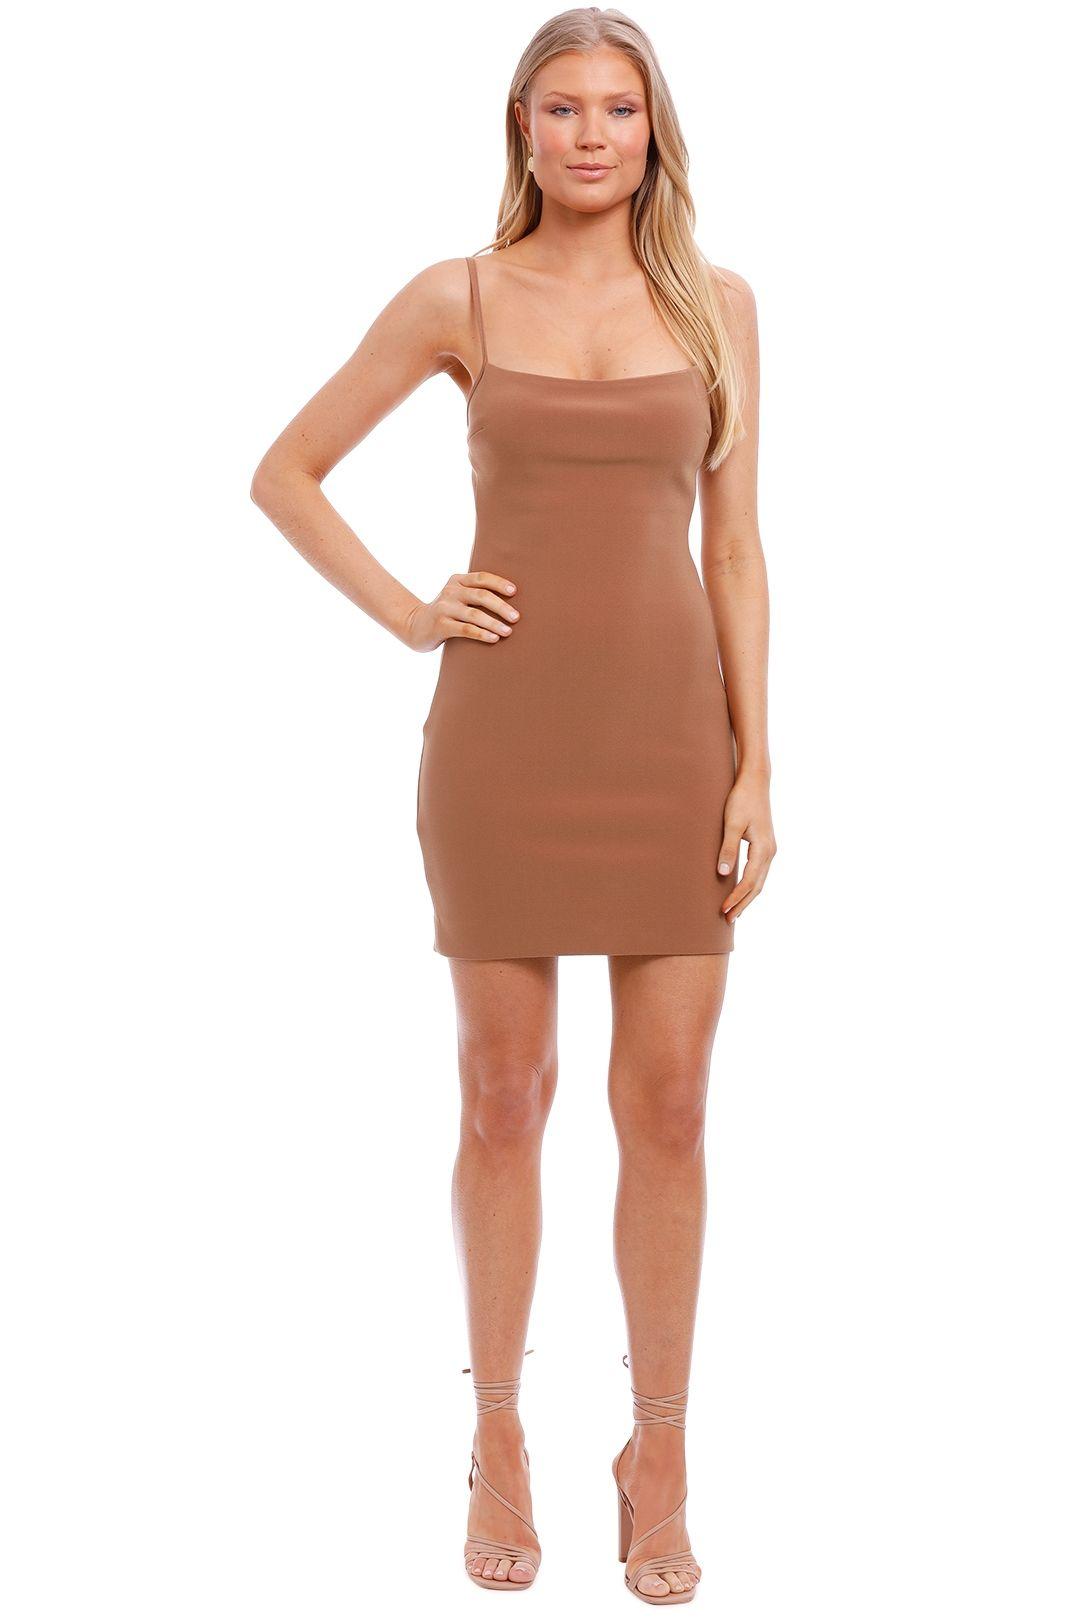 Bec and Bridge Maddison Mini Dress Chocolate brown